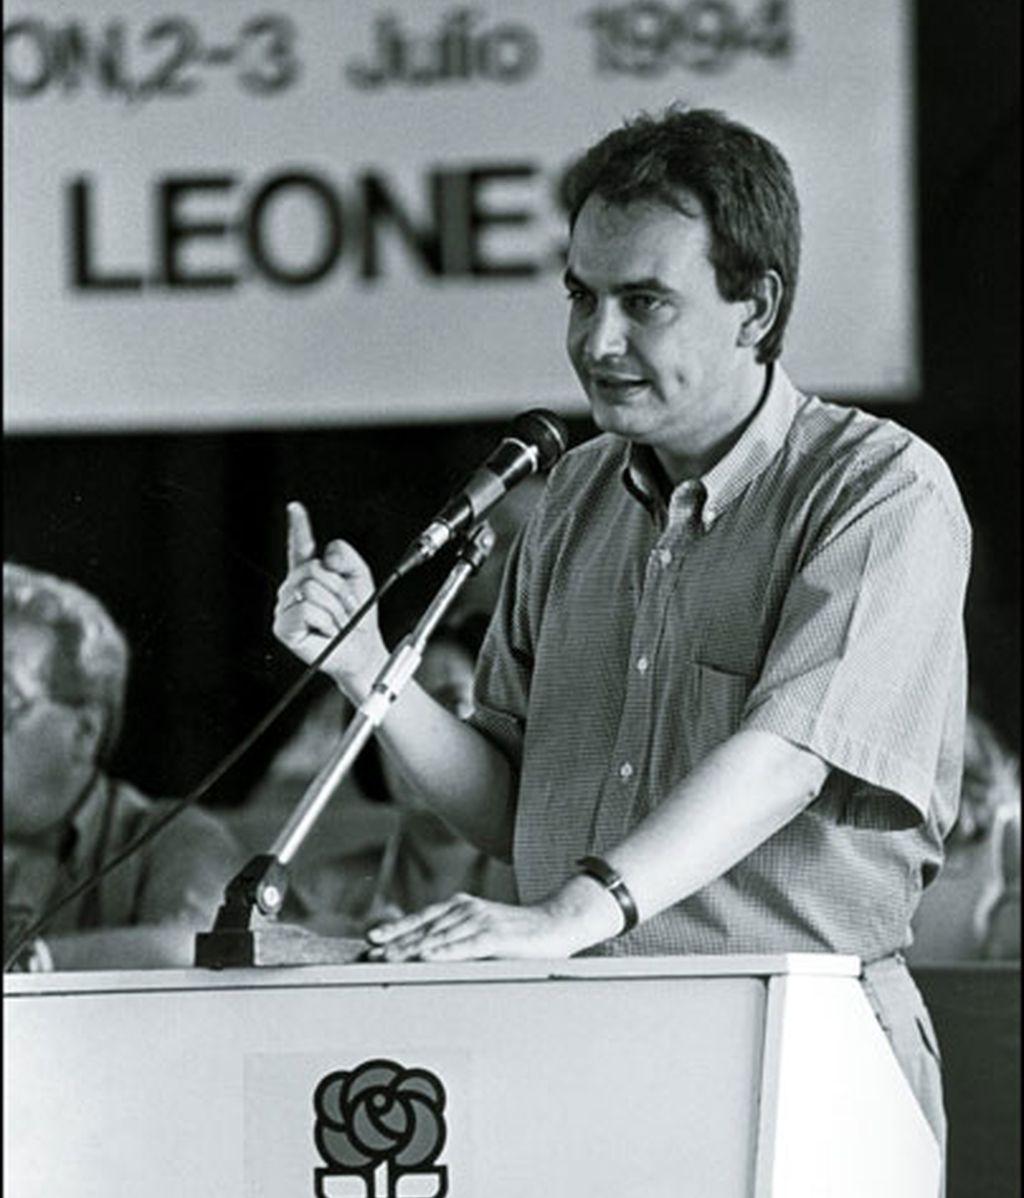 Mitin en León en 1994